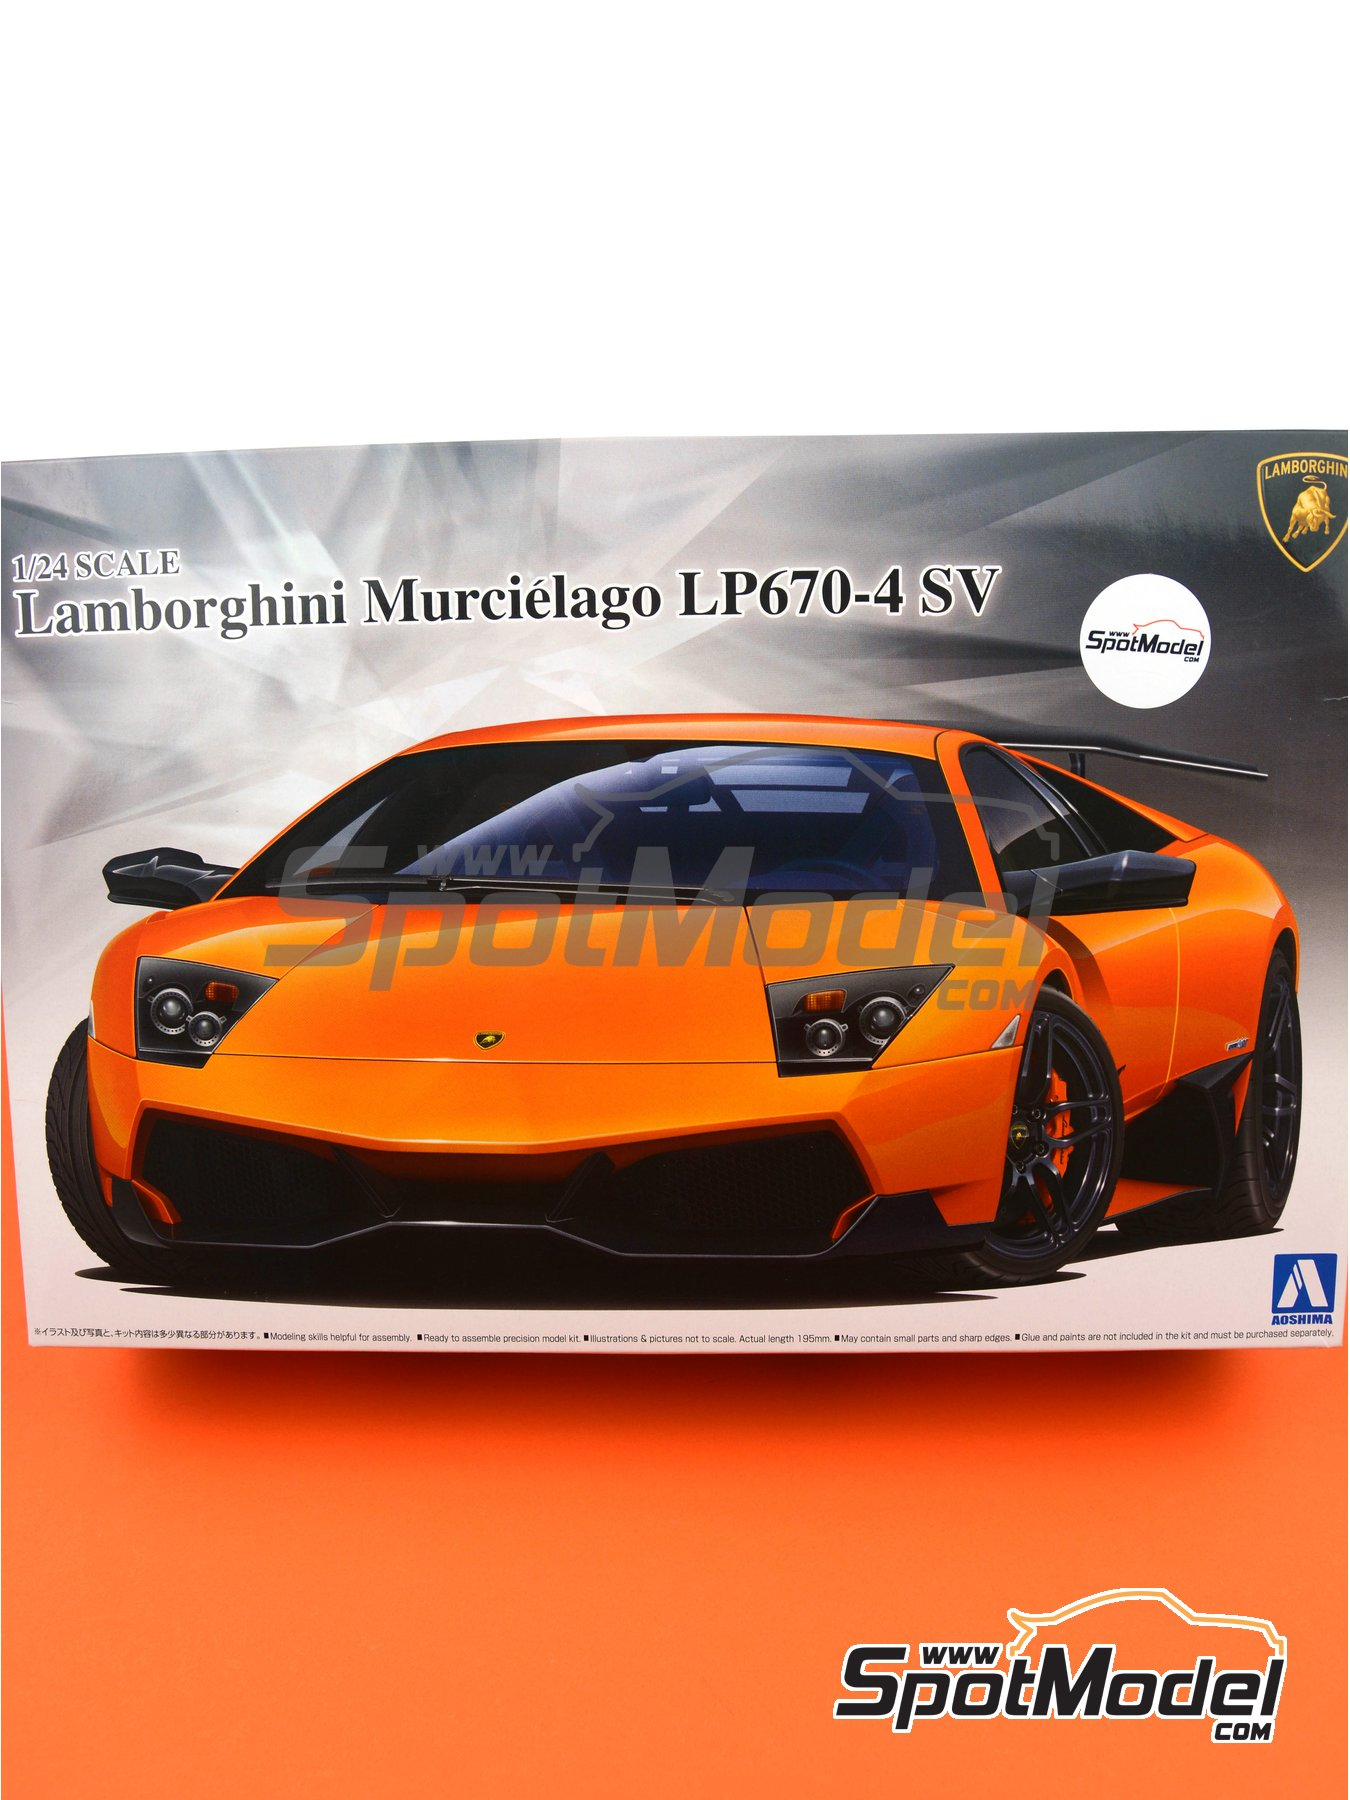 Lamborghini Murcielago LP670-4 SV SuperVeloce | Maqueta de coche en escala1/24 fabricado por Aoshima (ref.007068, tambien 07068) image